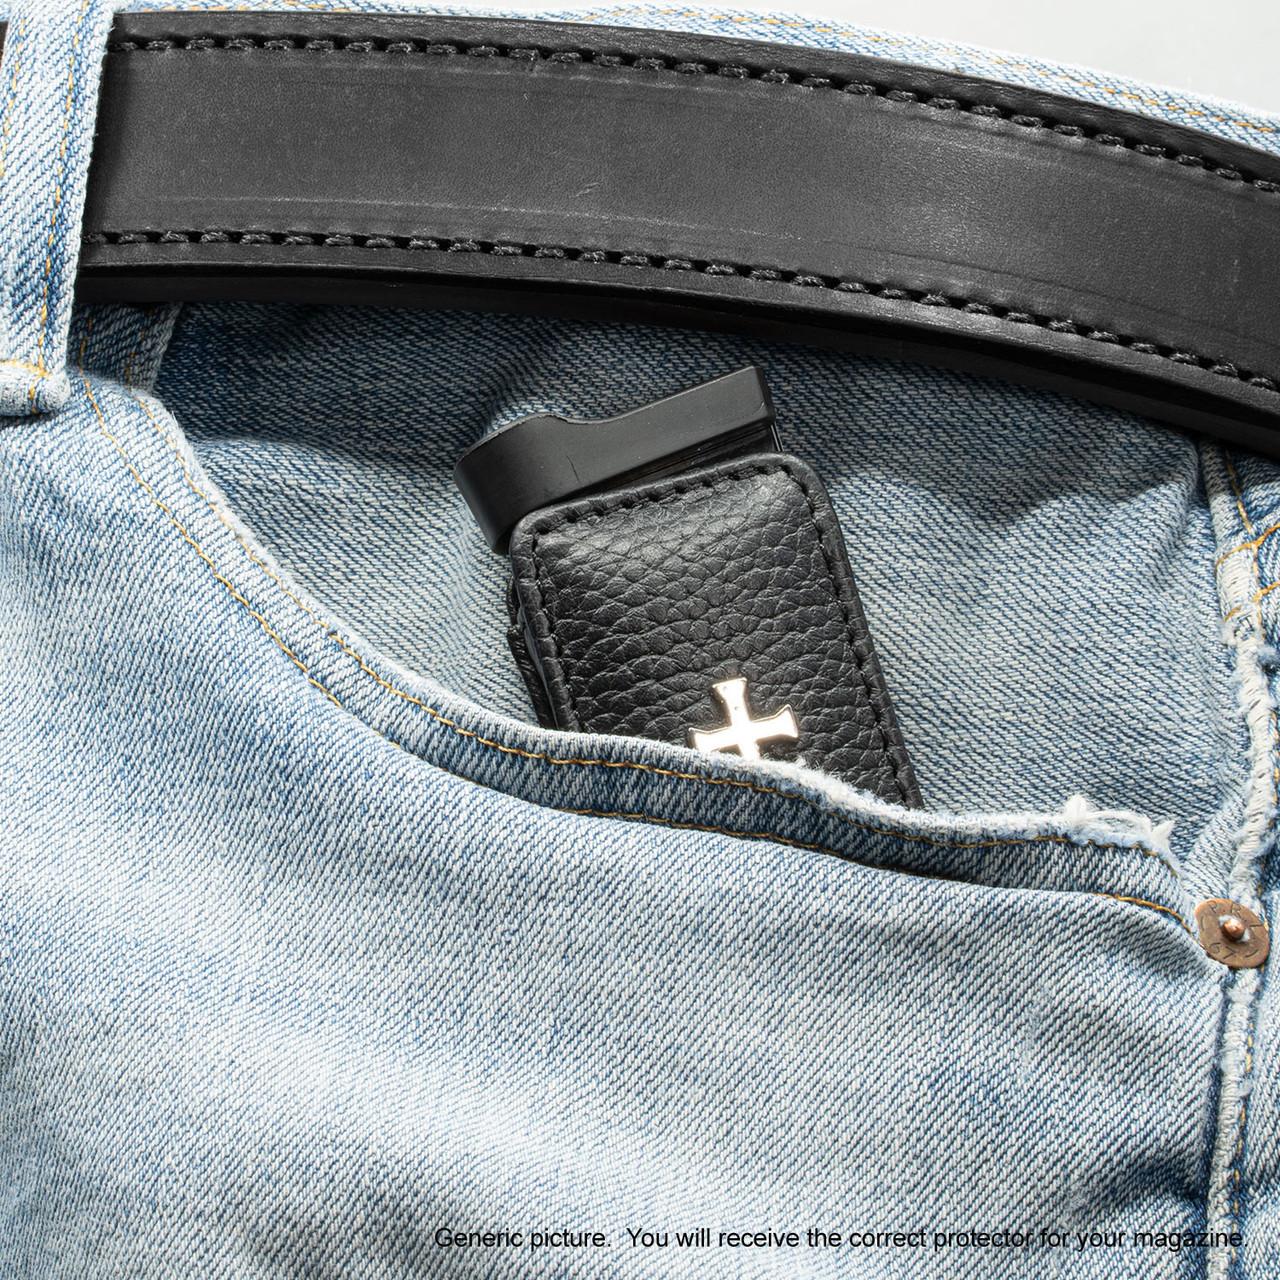 Glock 27 Black Leather Cross Magazine Pocket Protector